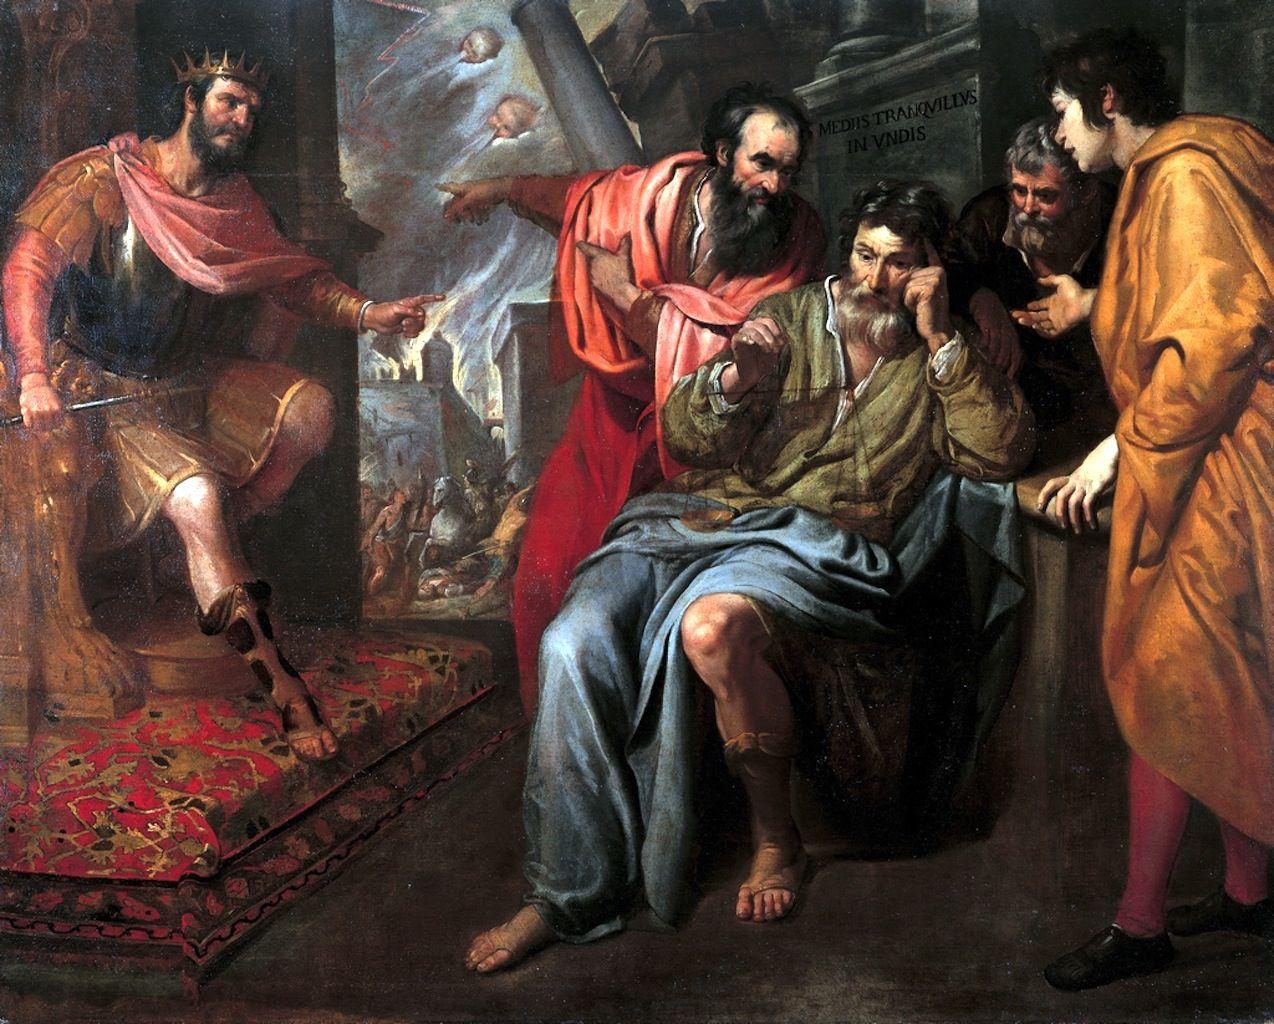 Nec Spe Nec Metu Domenico Fiasella Il Sarzana The Art Painting Image